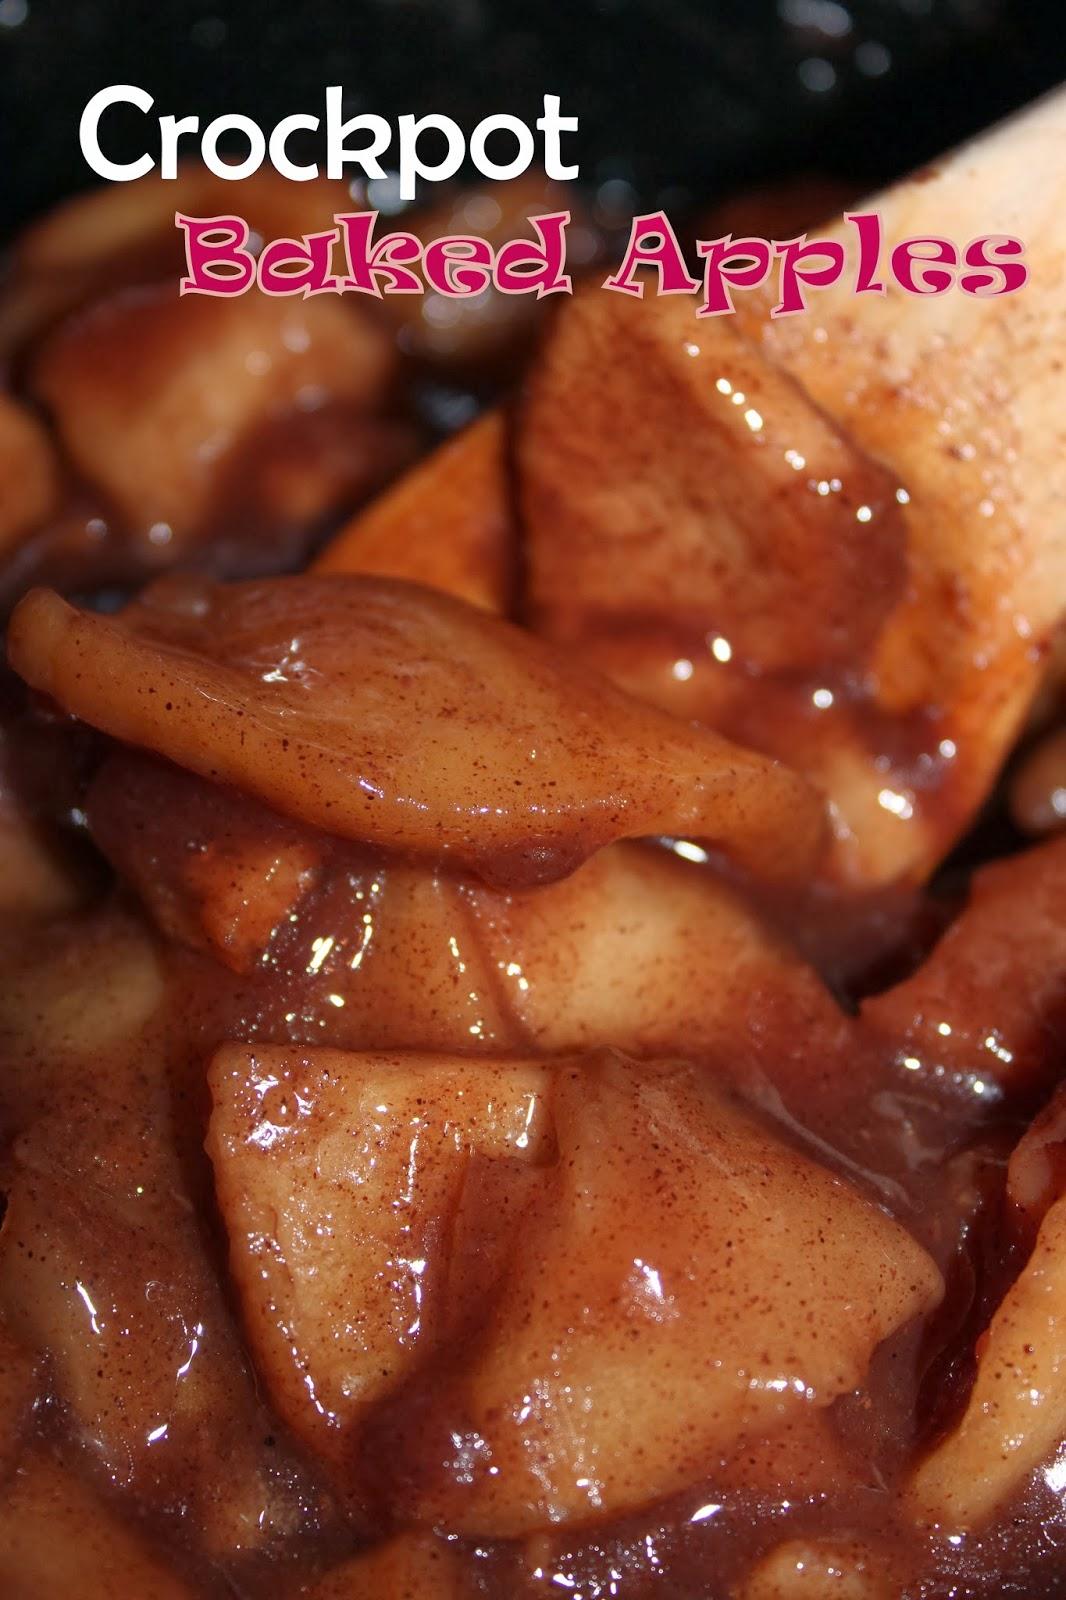 Harris Sisters GirlTalk: Crockpot Baked Apples